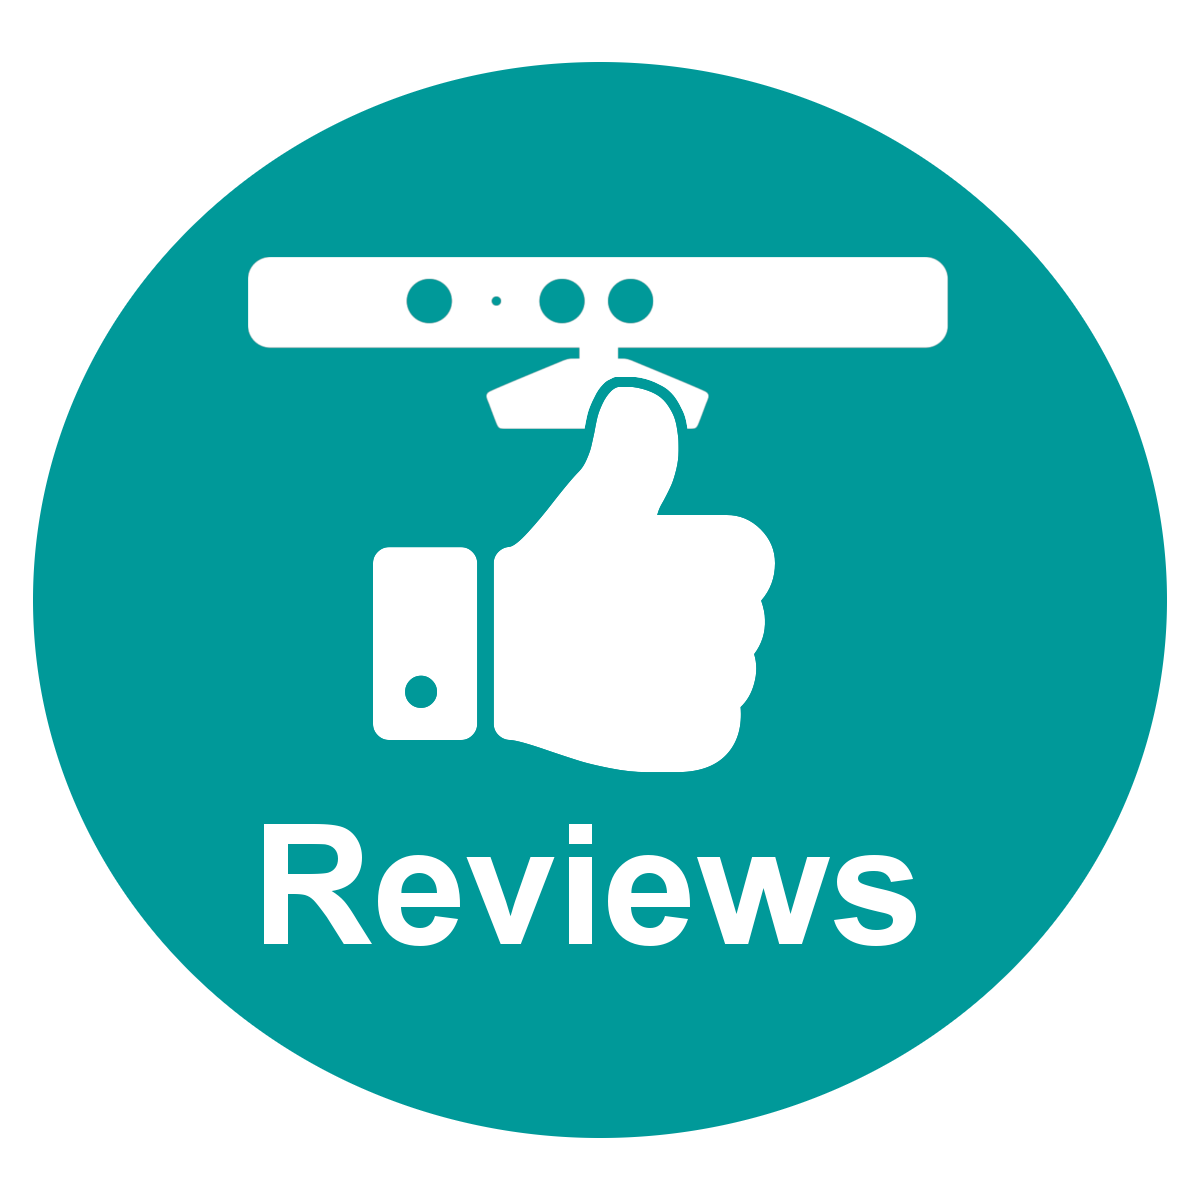 reviewsicon